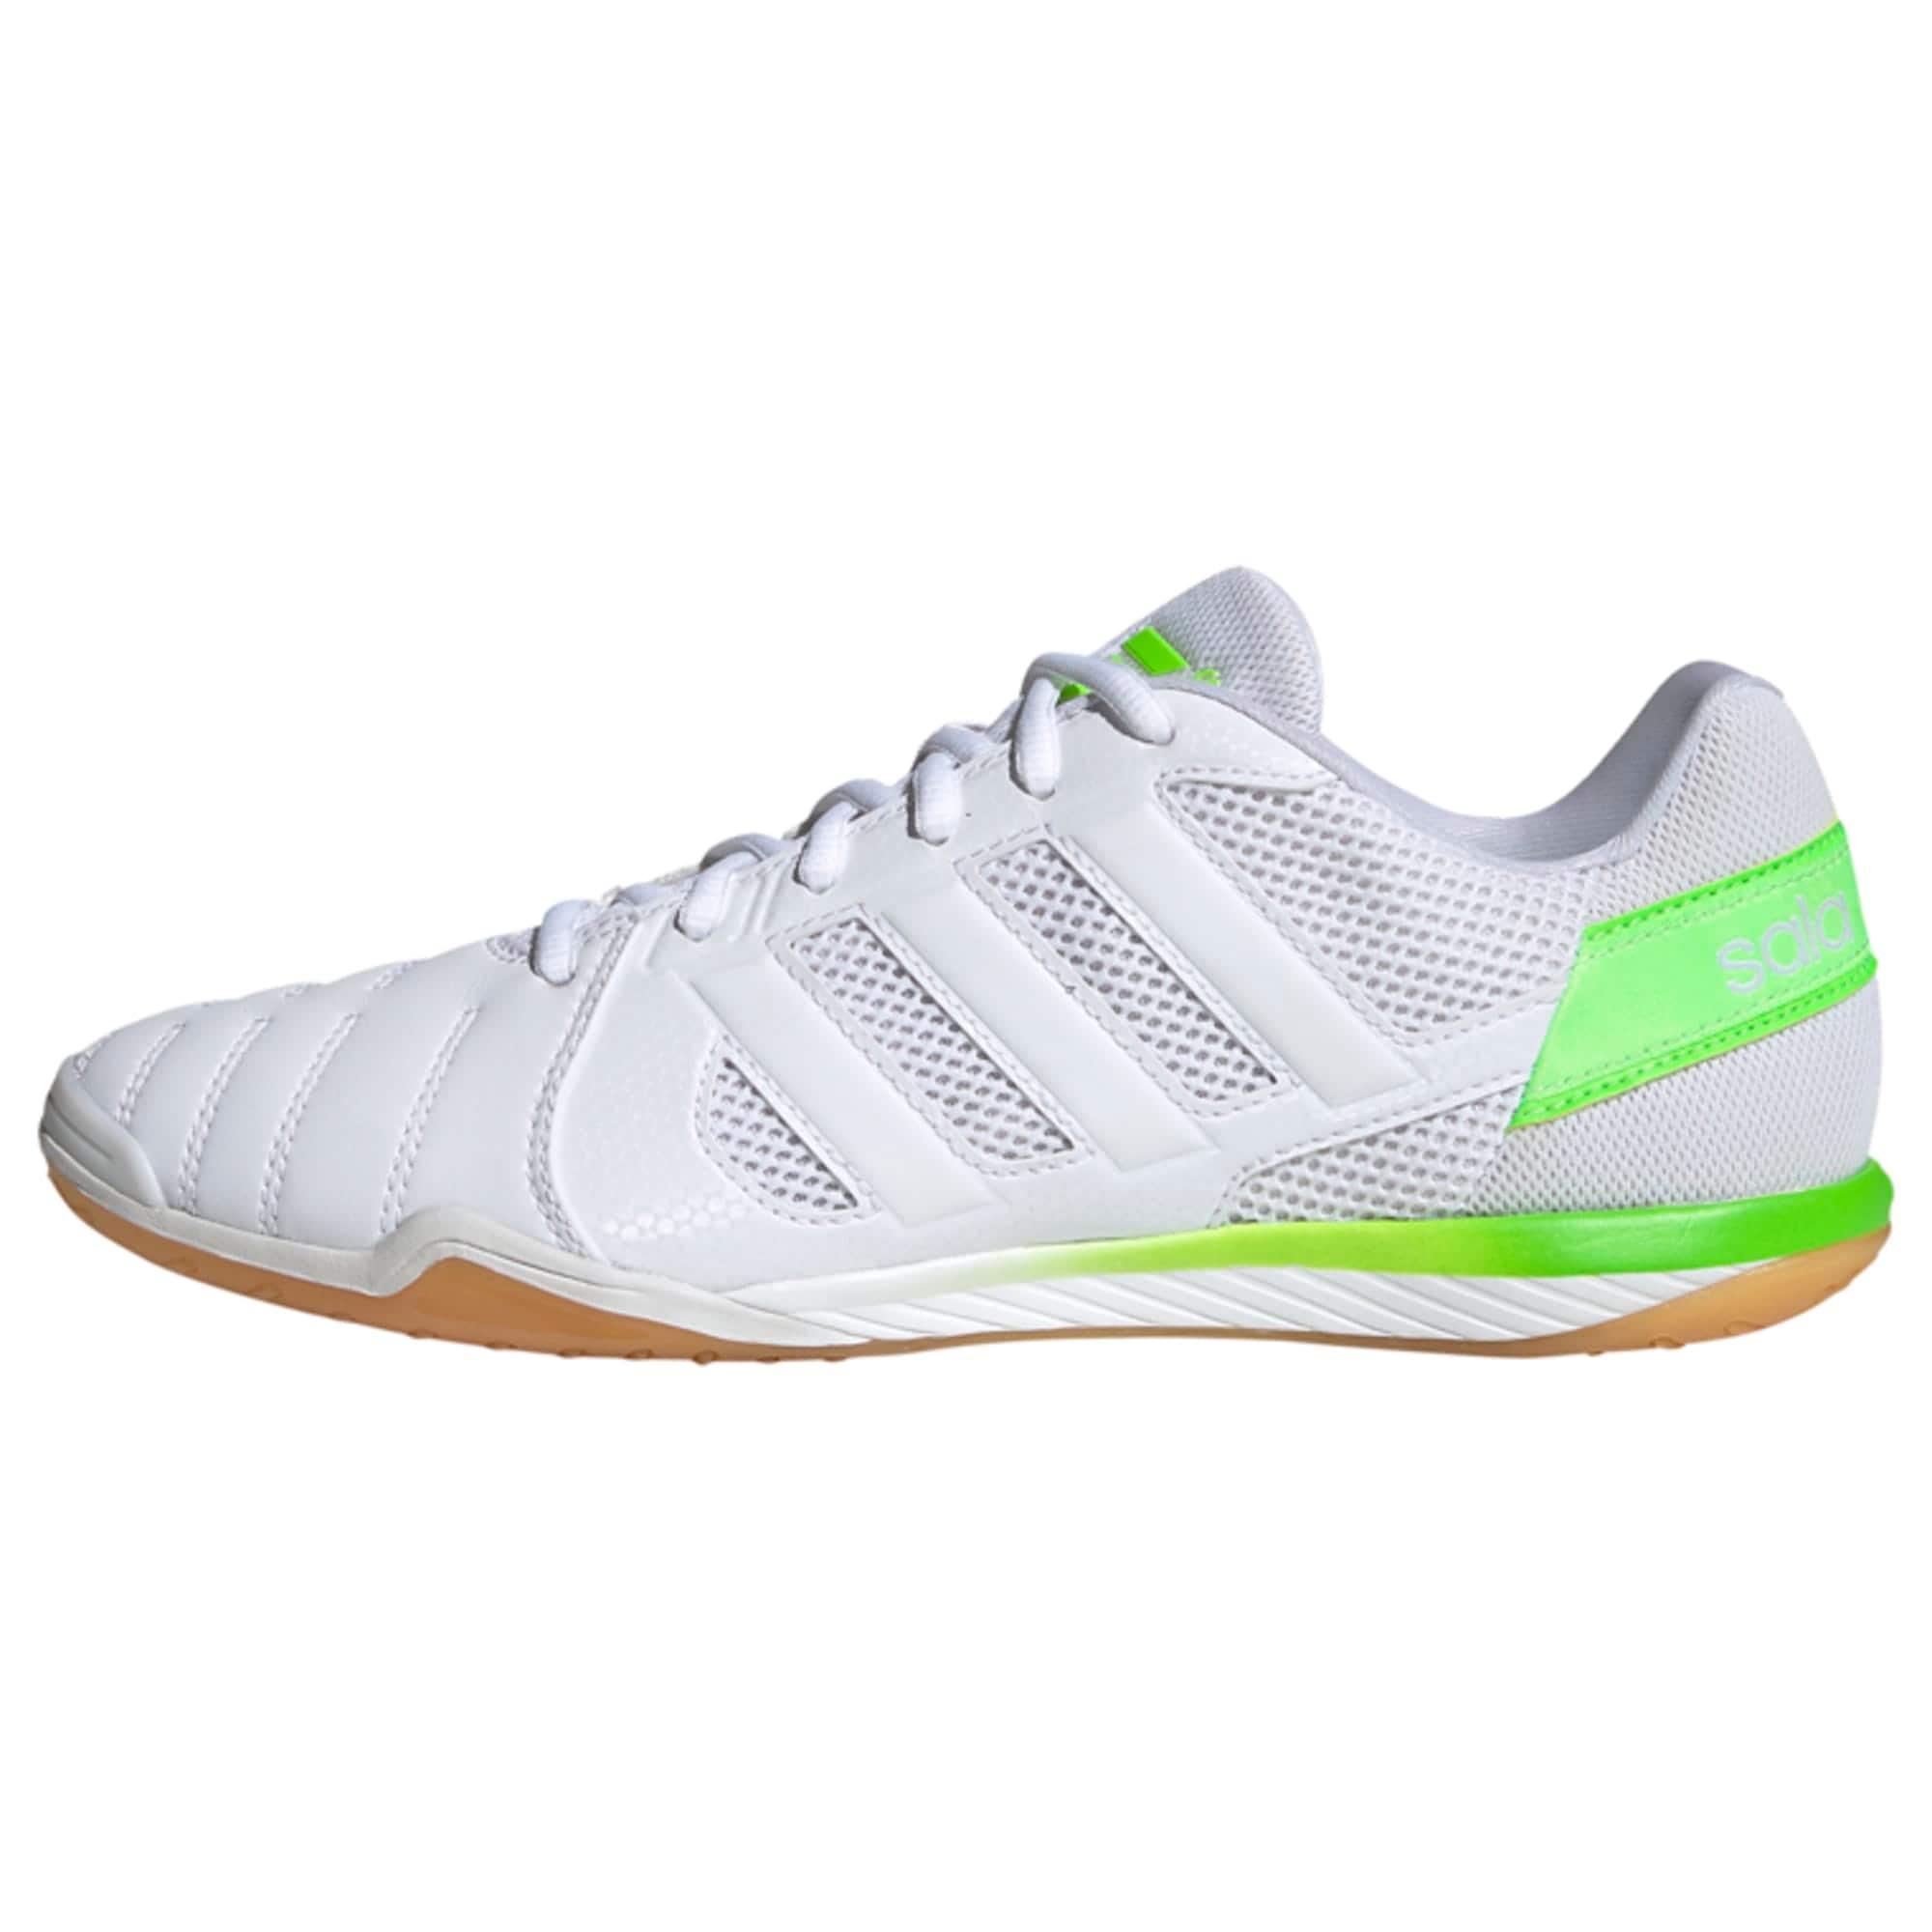 adidas performance scarpa da calcio bianco